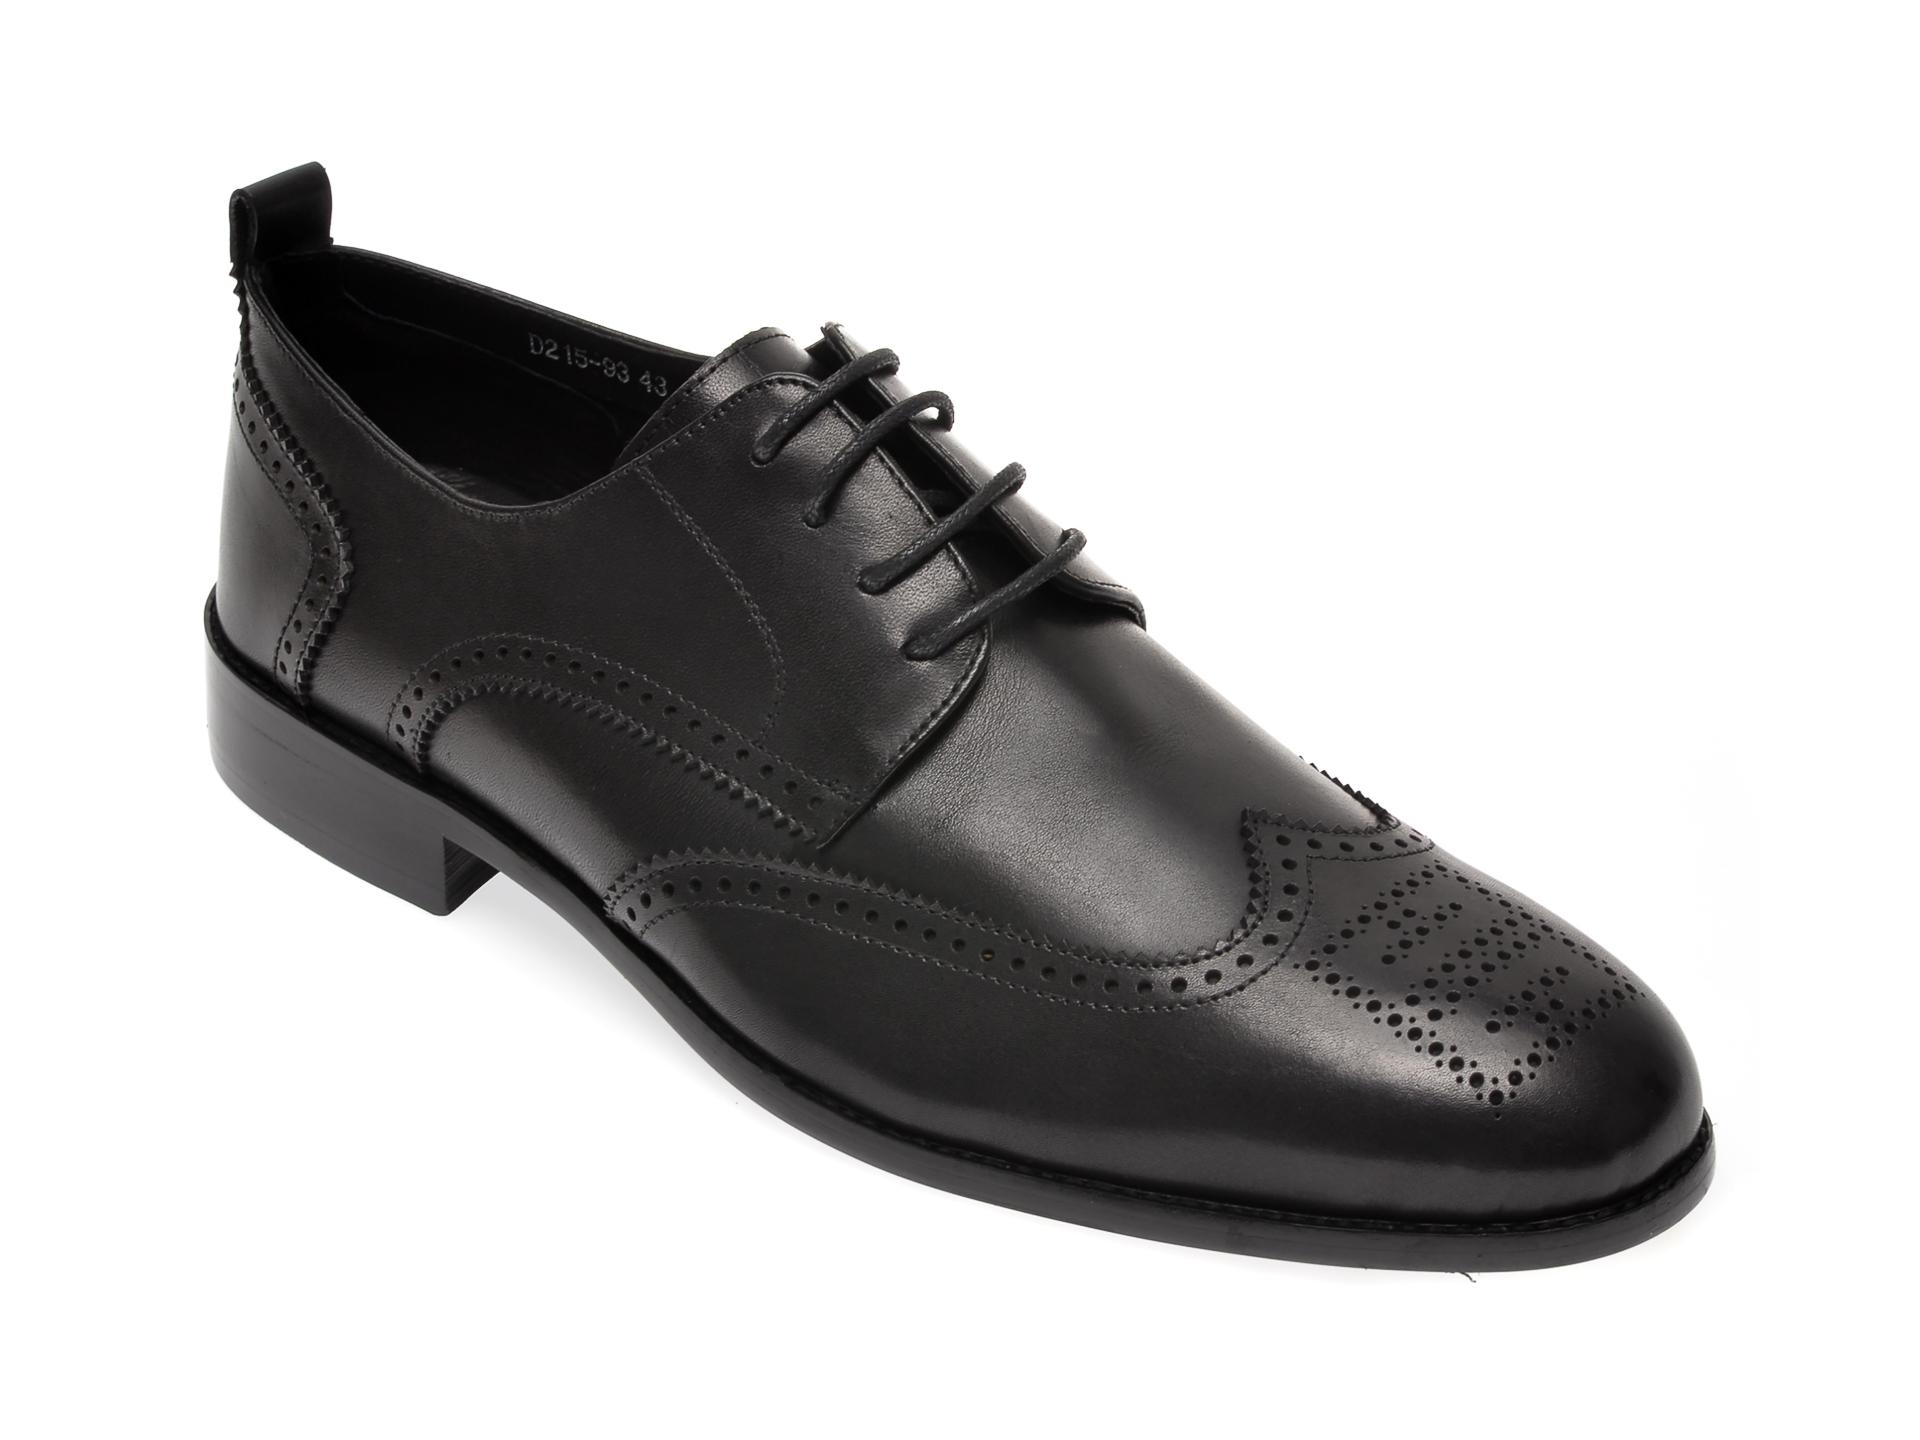 Pantofi OTTER negri, D21593, din piele naturala imagine